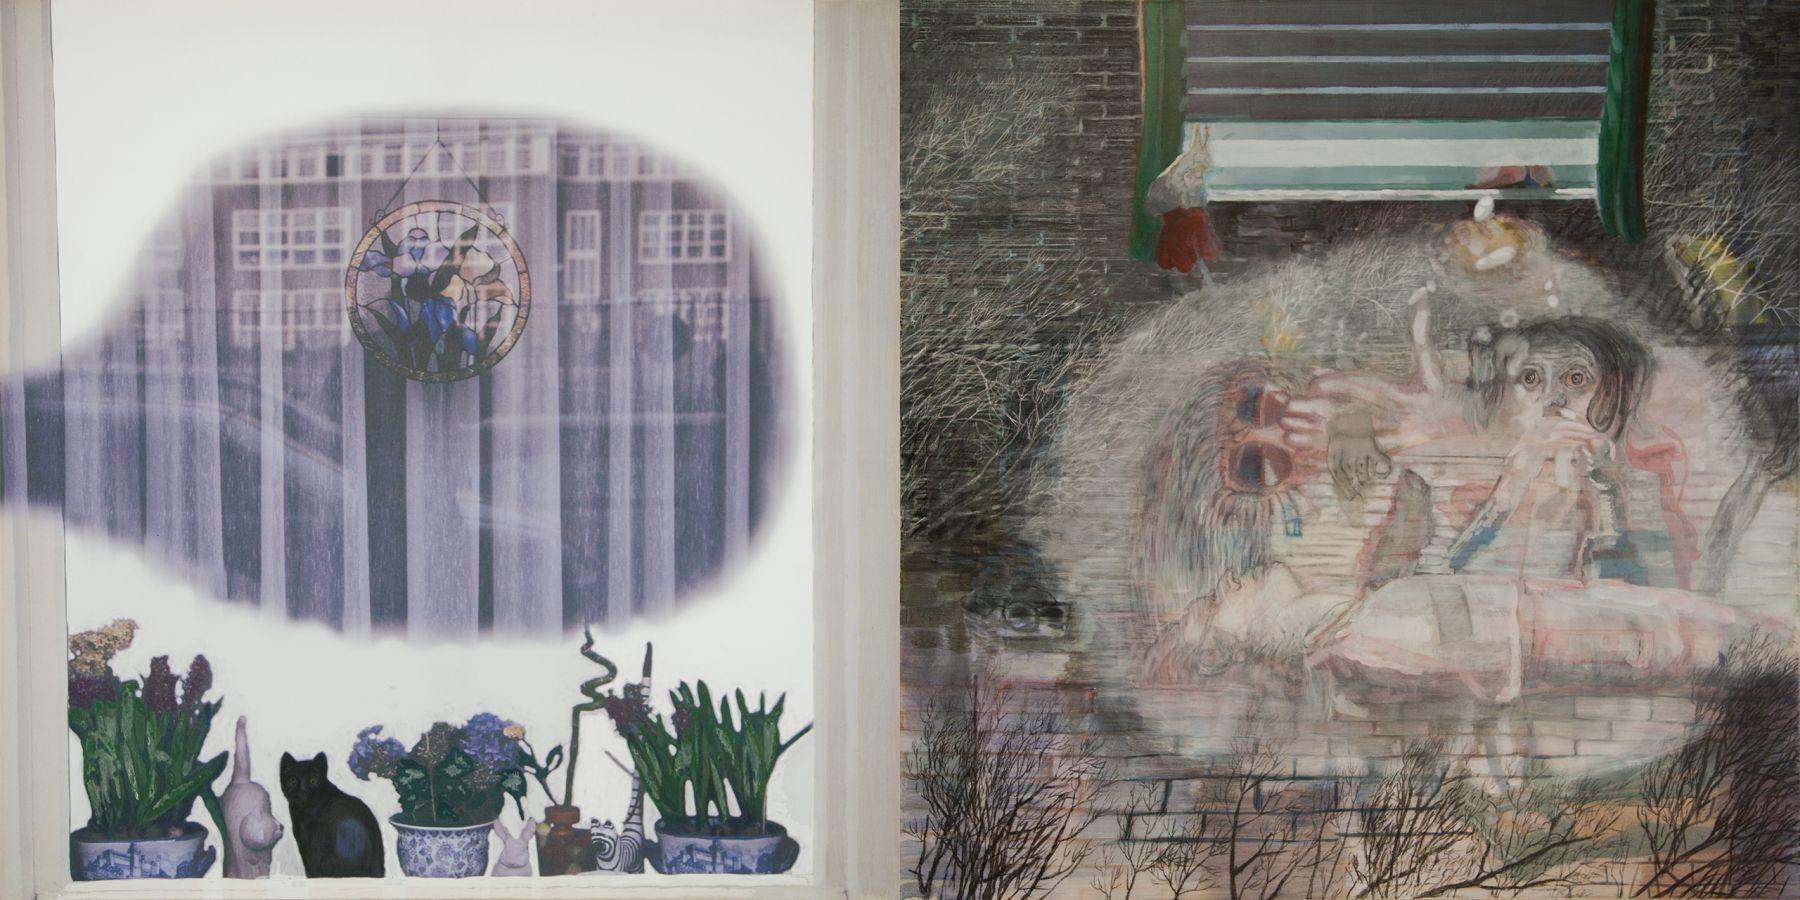 28. The Smoke Curtain, 2006-2007, charcoal/acrylic/tempera/oil/print/canvas, 200 x 400 cm